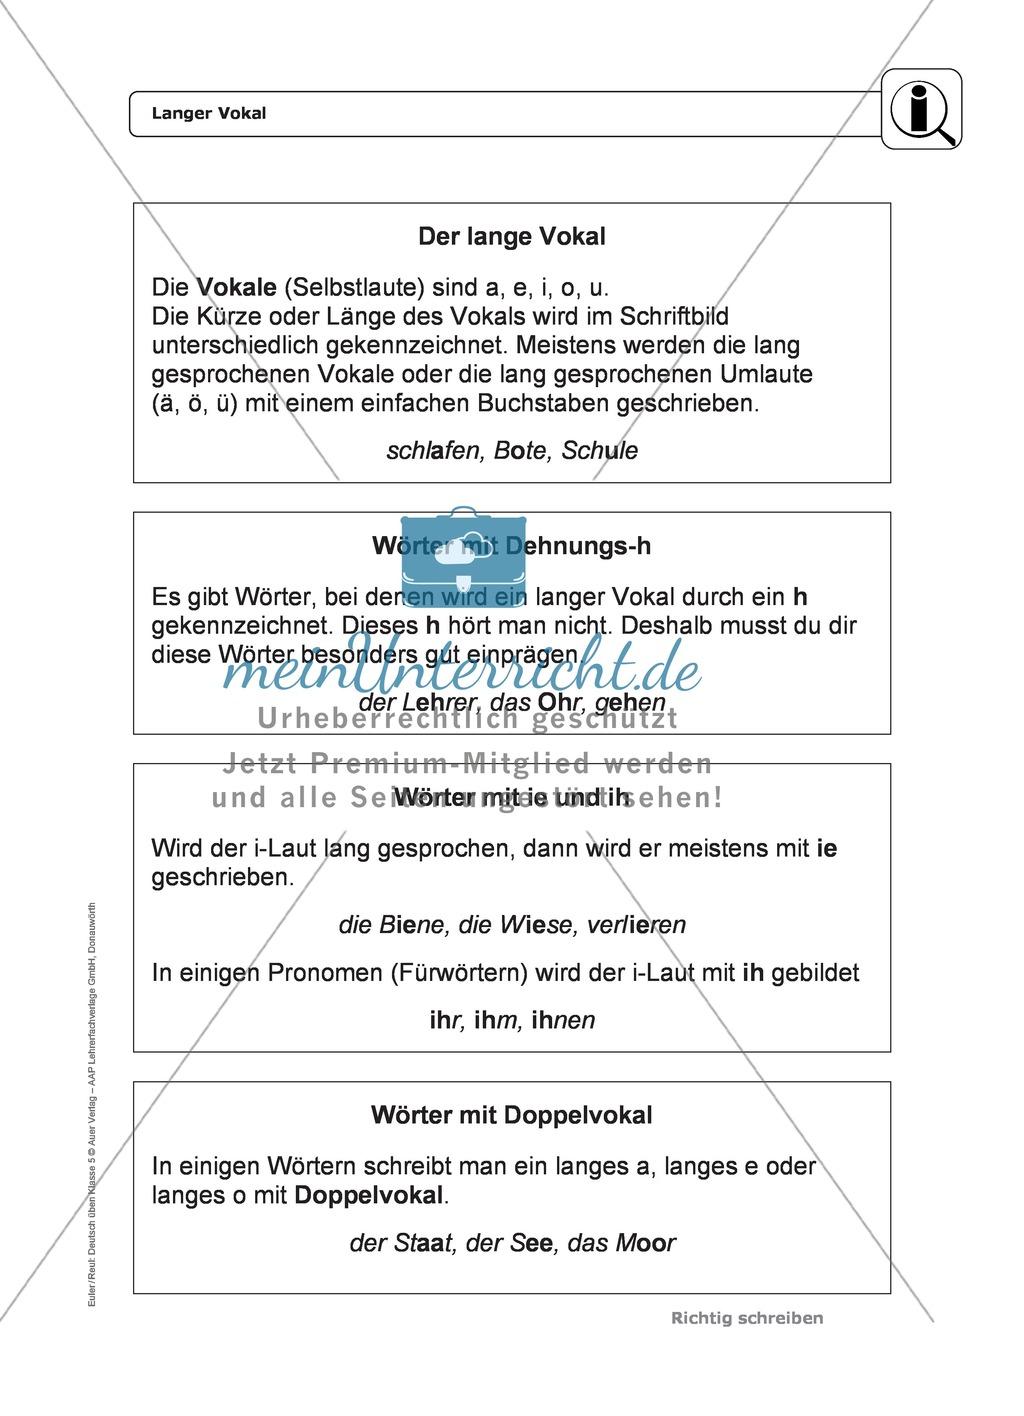 Tolle Lange Vokal Arbeitsblatt Ideen - Mathe Arbeitsblatt - urederra ...